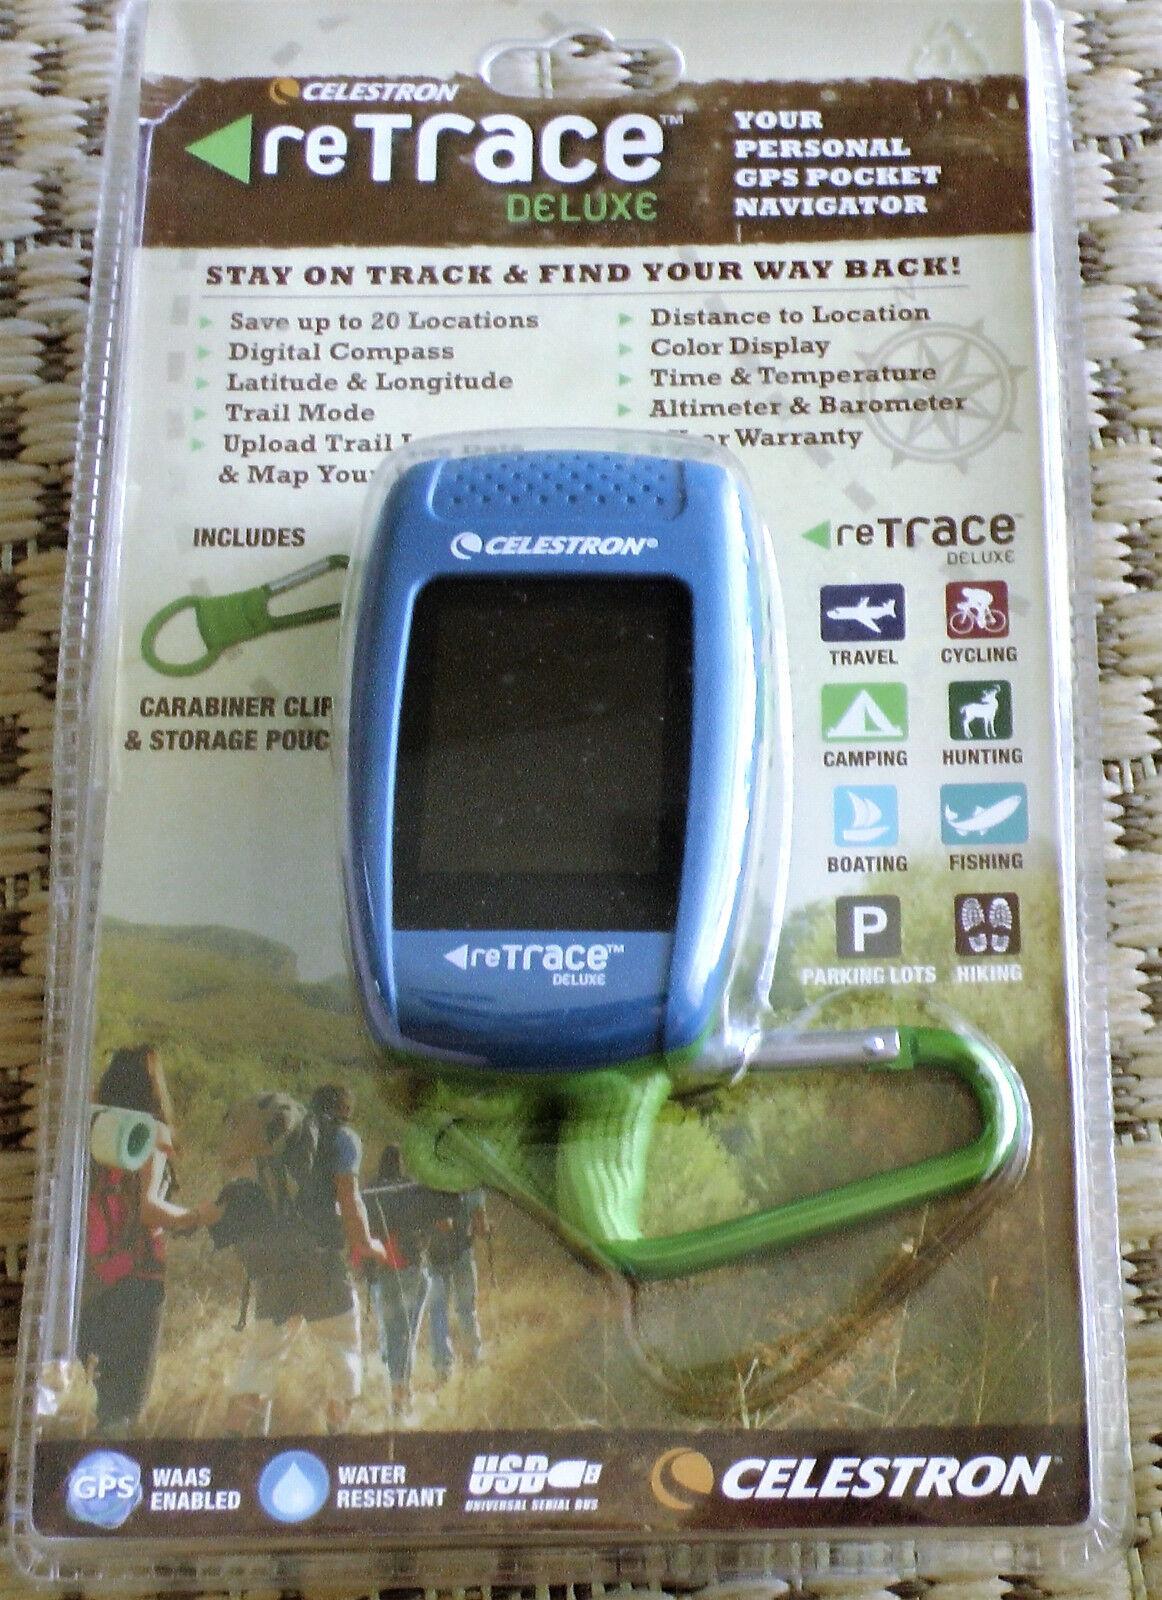 Celestron Retrace Deluxe Personal Gps Pocket Navigator - Blue